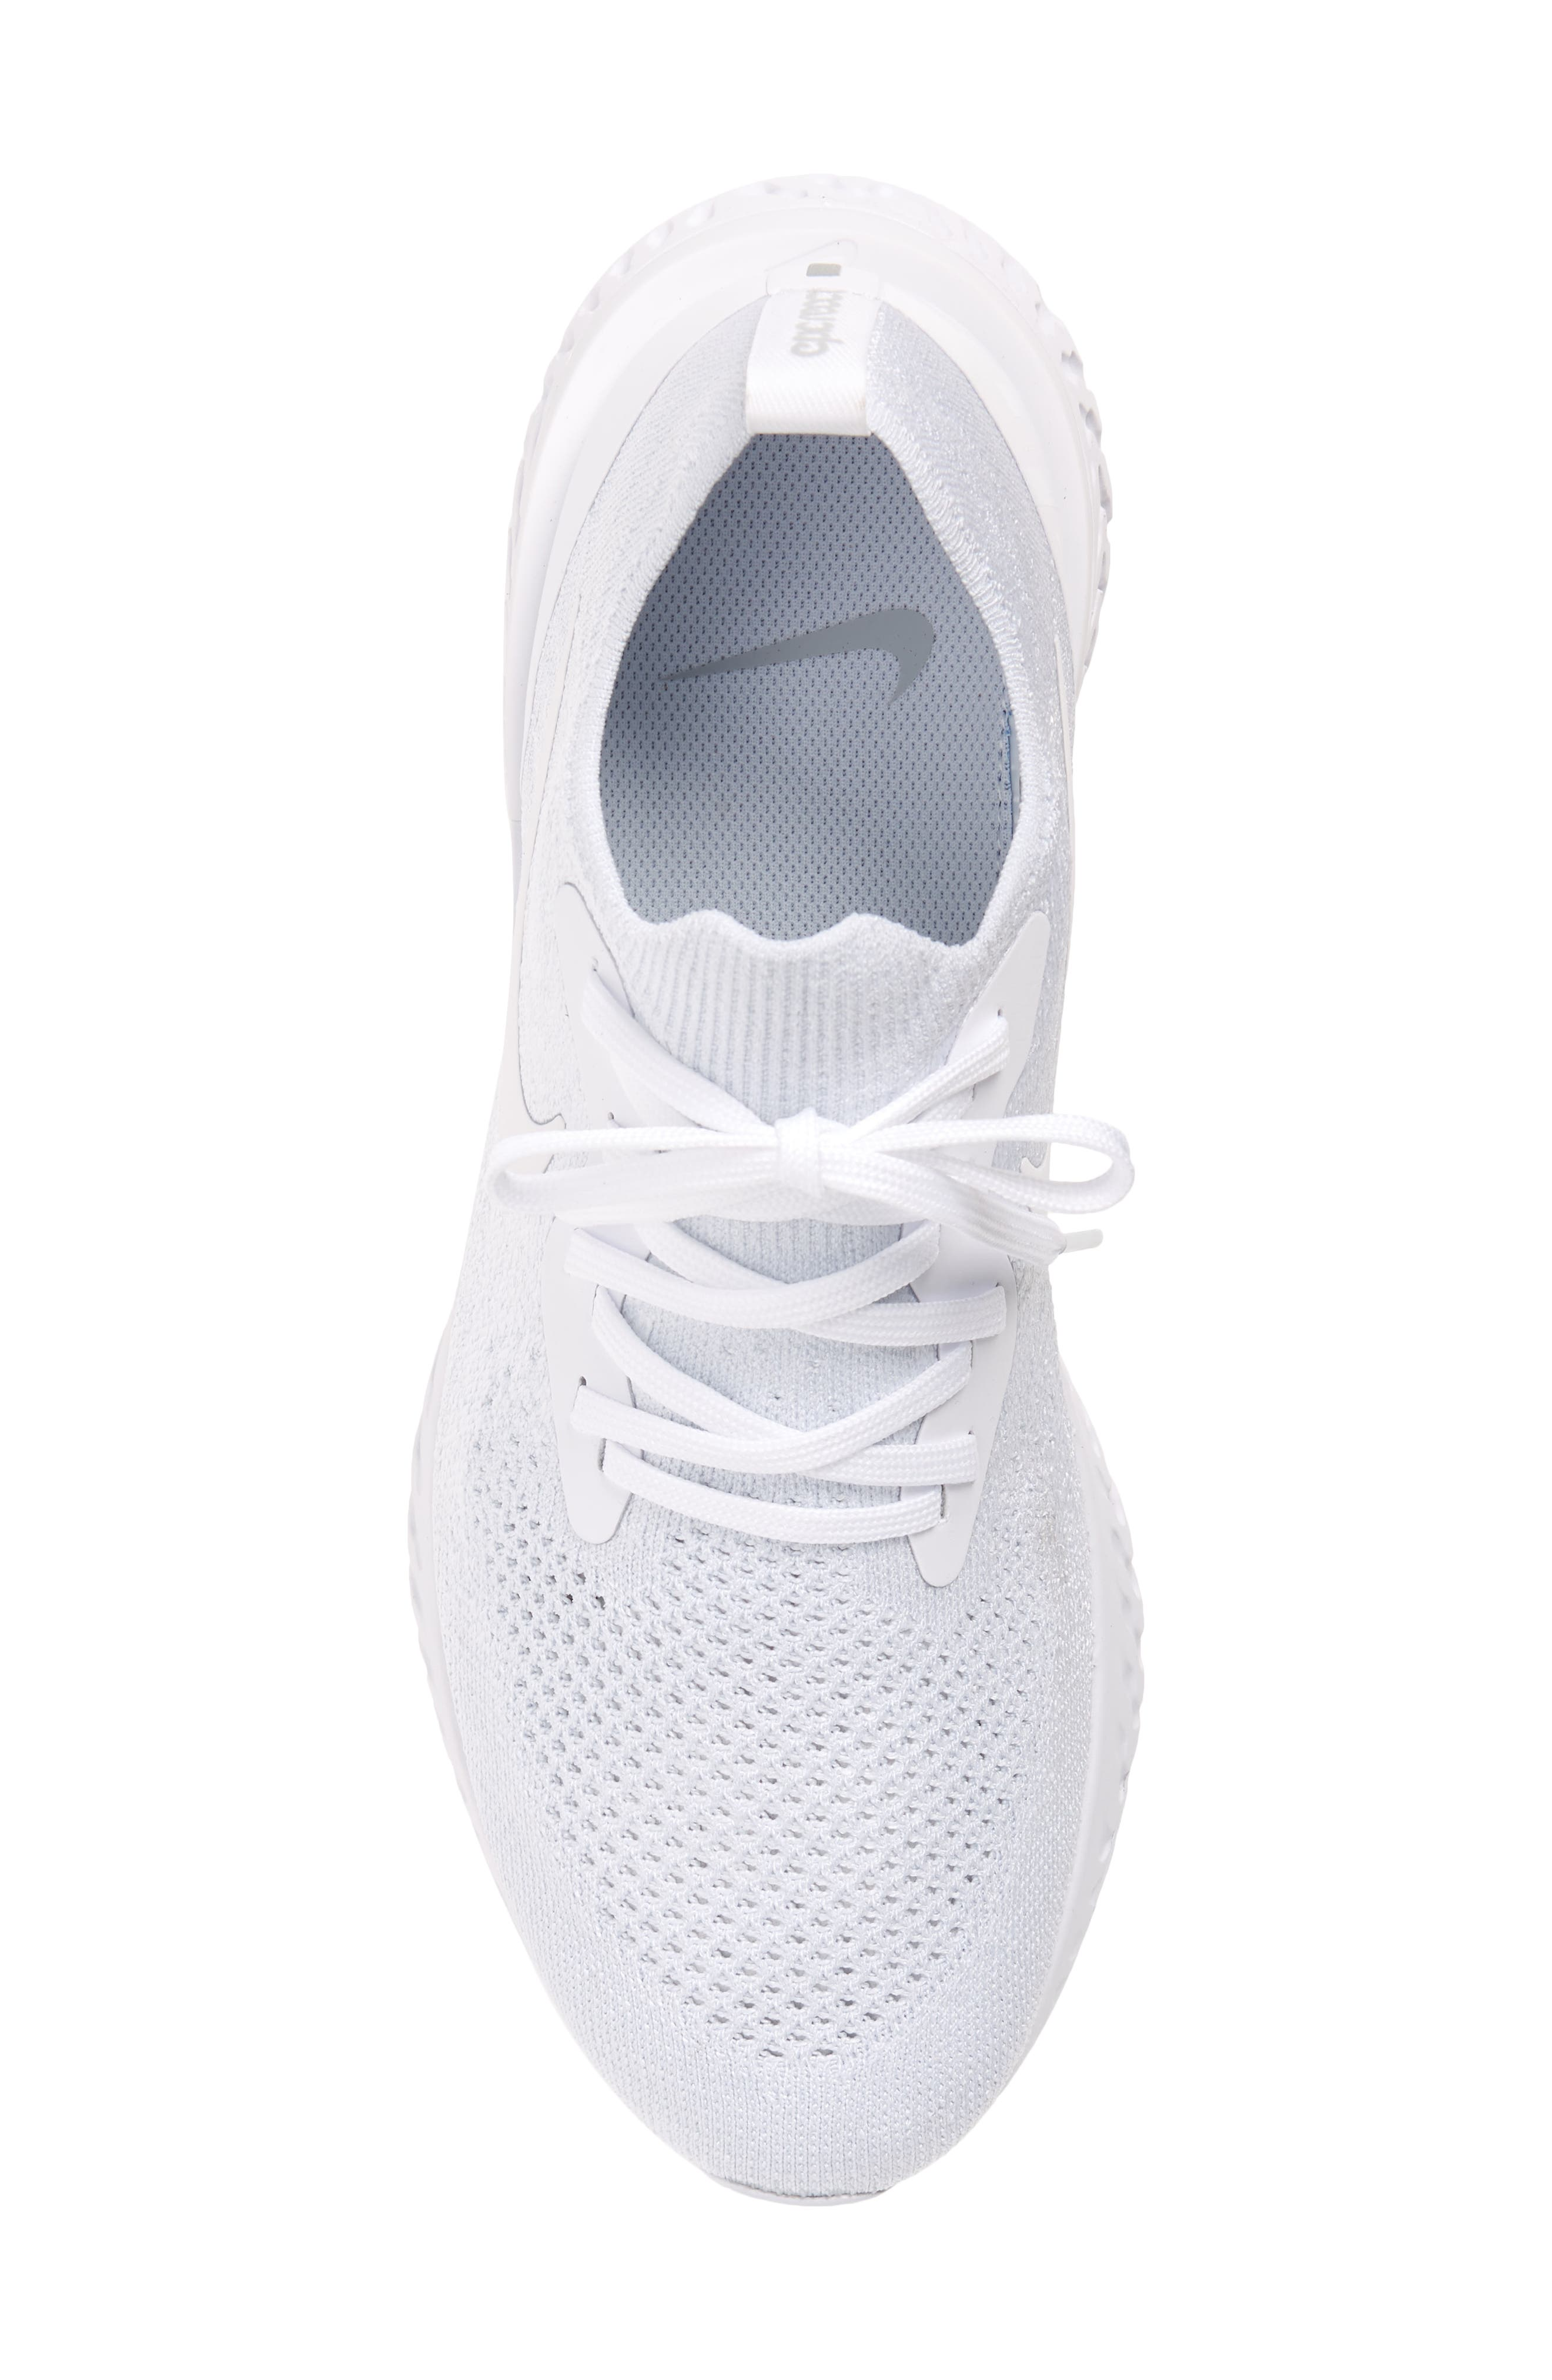 Epic React Flyknit Running Shoe,                             Alternate thumbnail 4, color,                             White